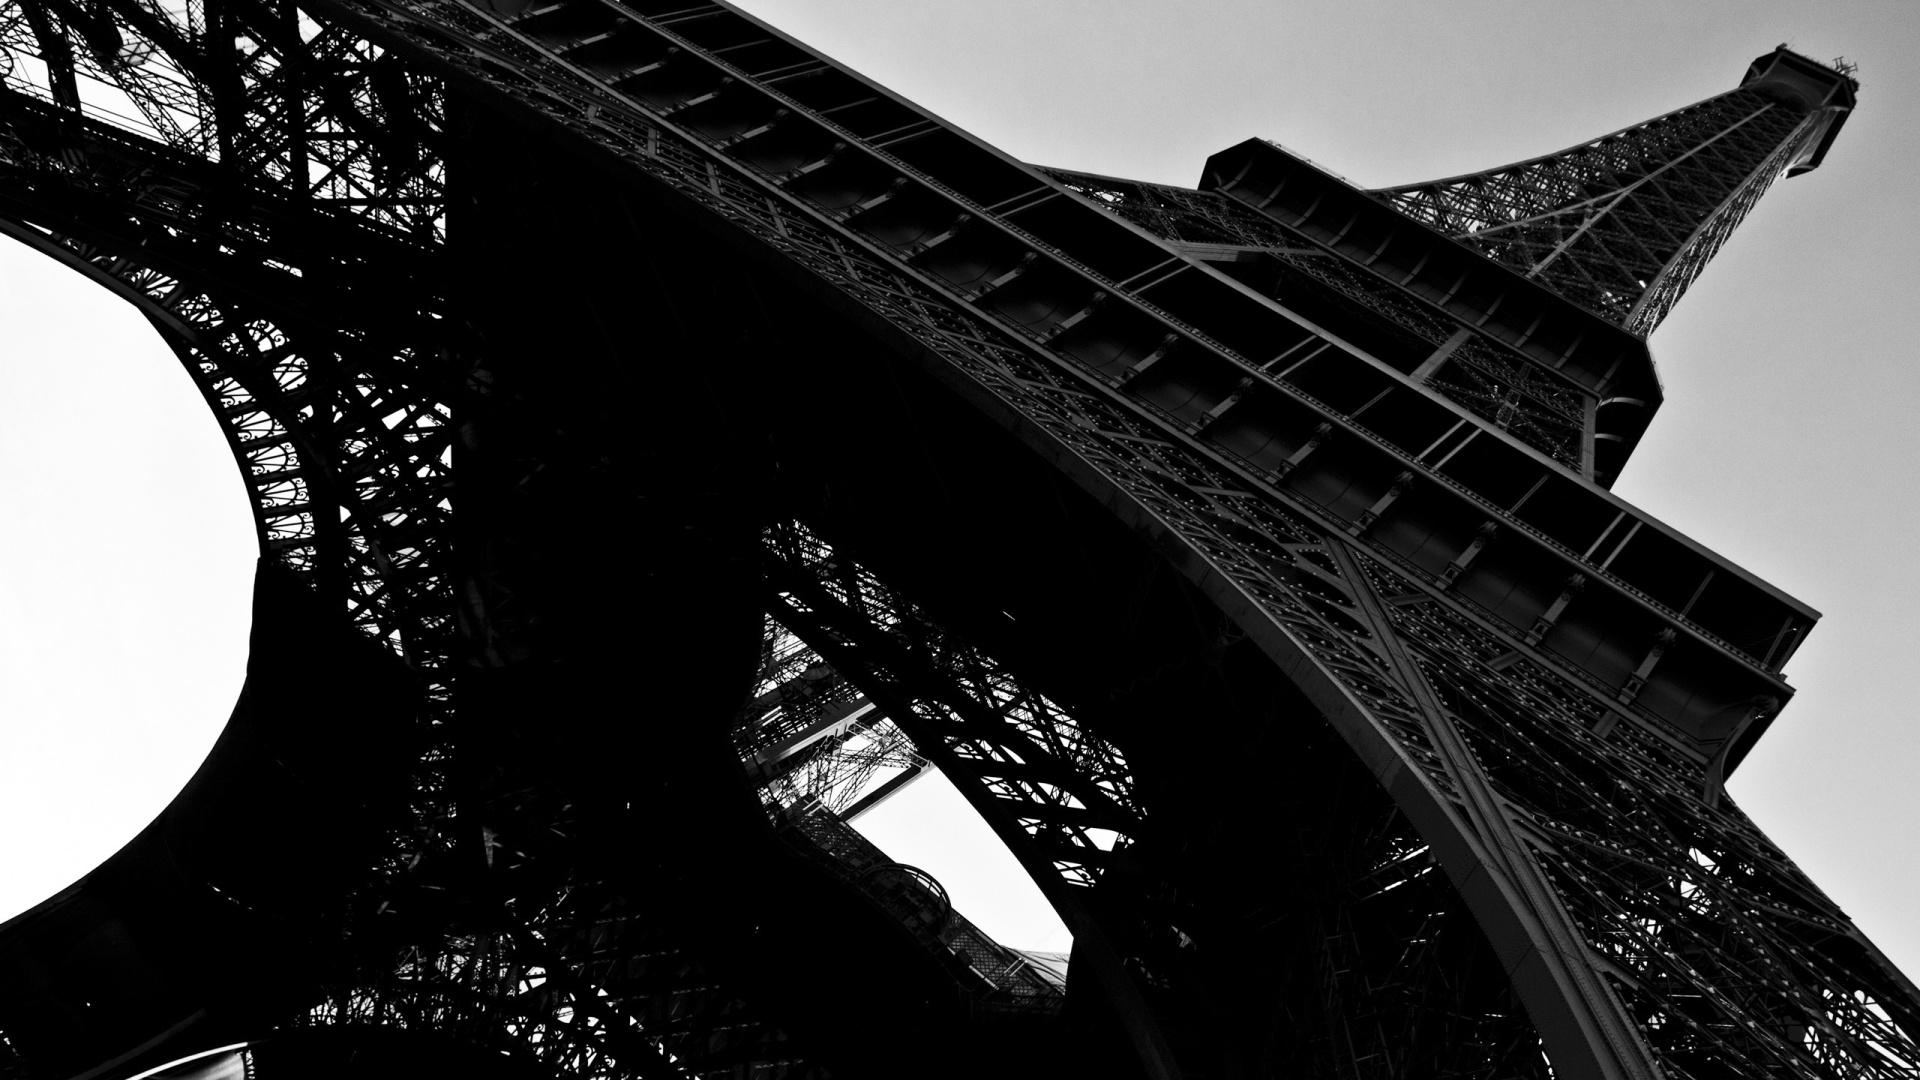 Eiffel Tower Black And White Desktop Wallpaper 1920x1080